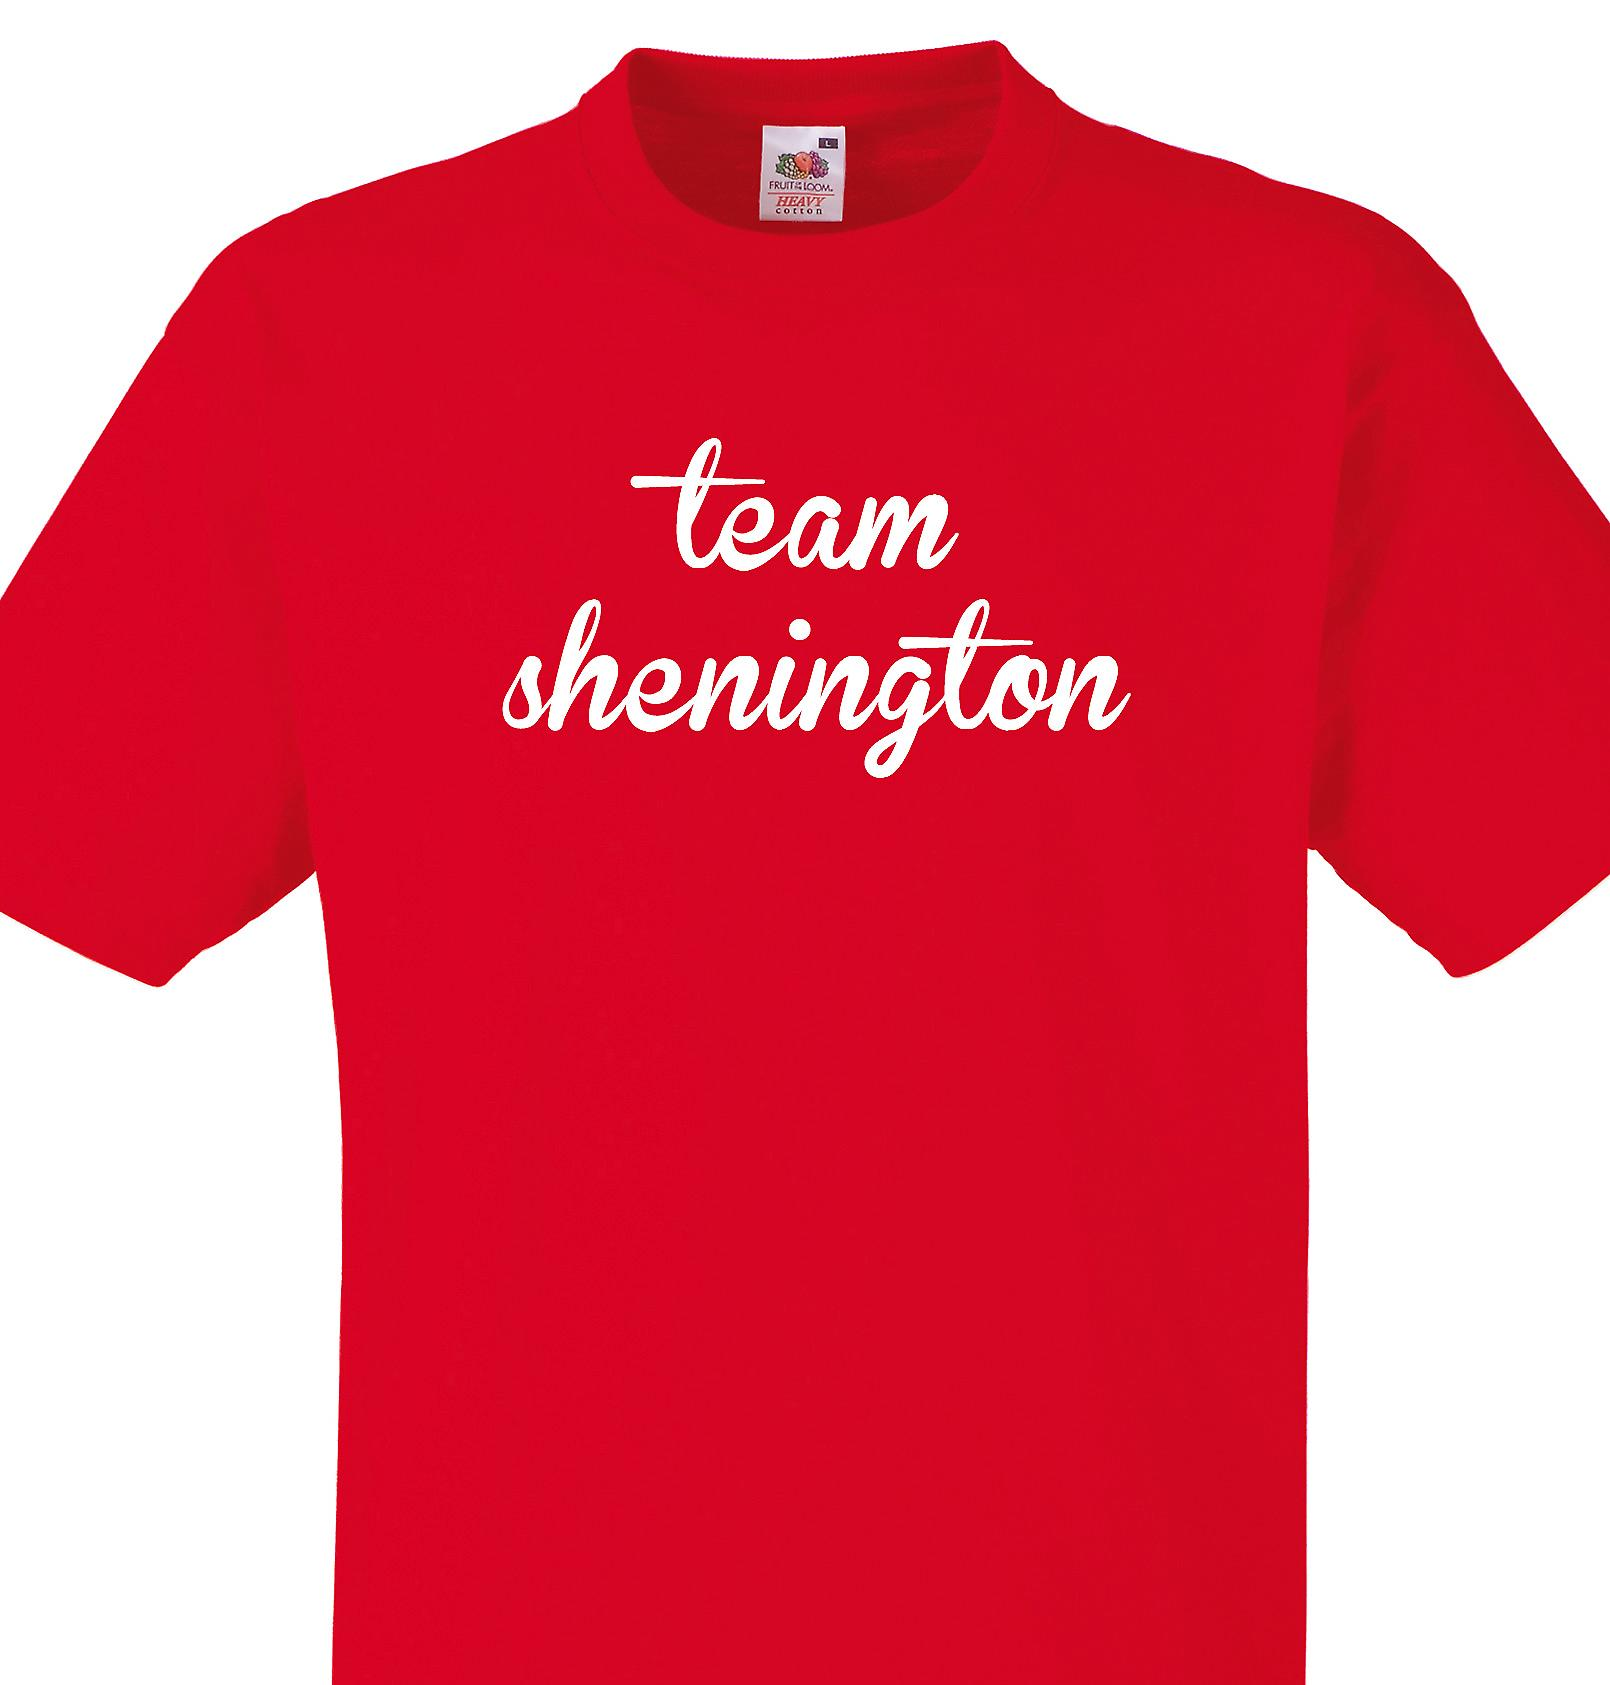 Team Shenington Red T shirt